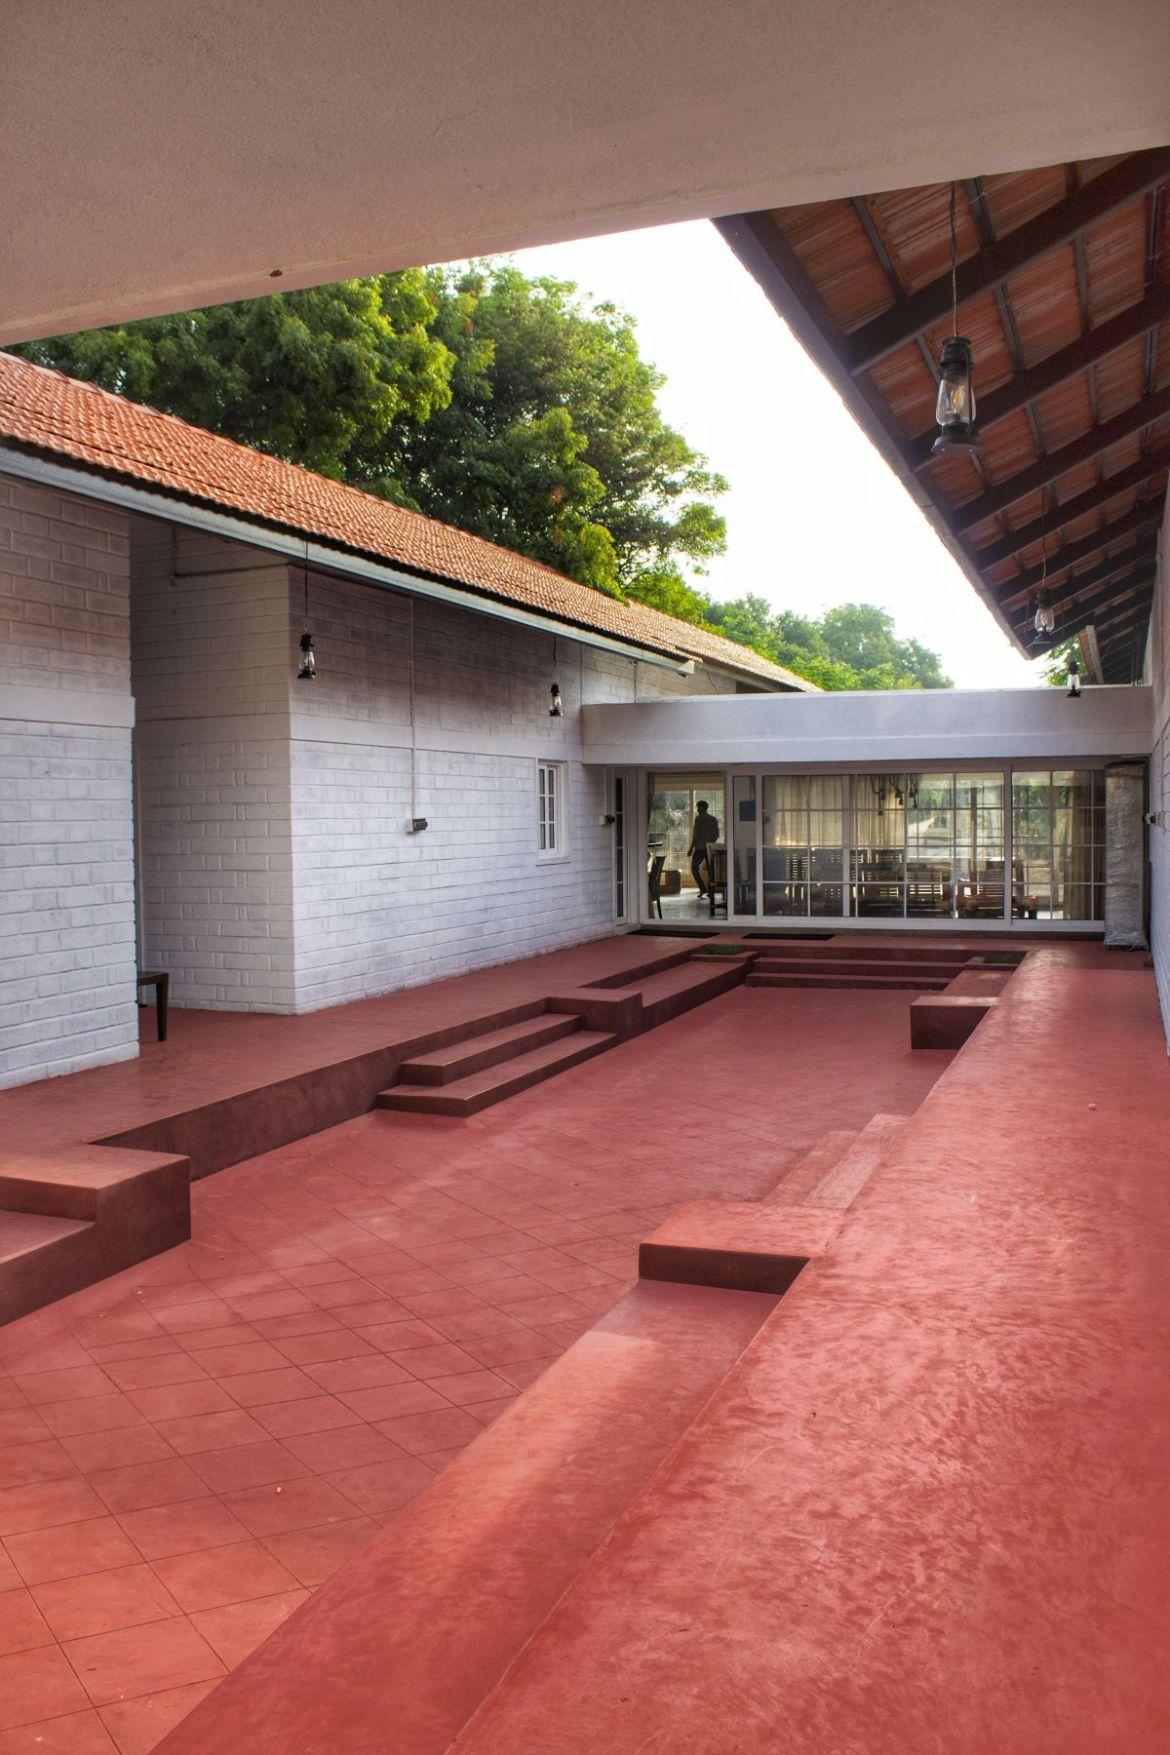 The Barn House at Tumkur, Karnataka, by Saraff & Sharalaya Design House 3